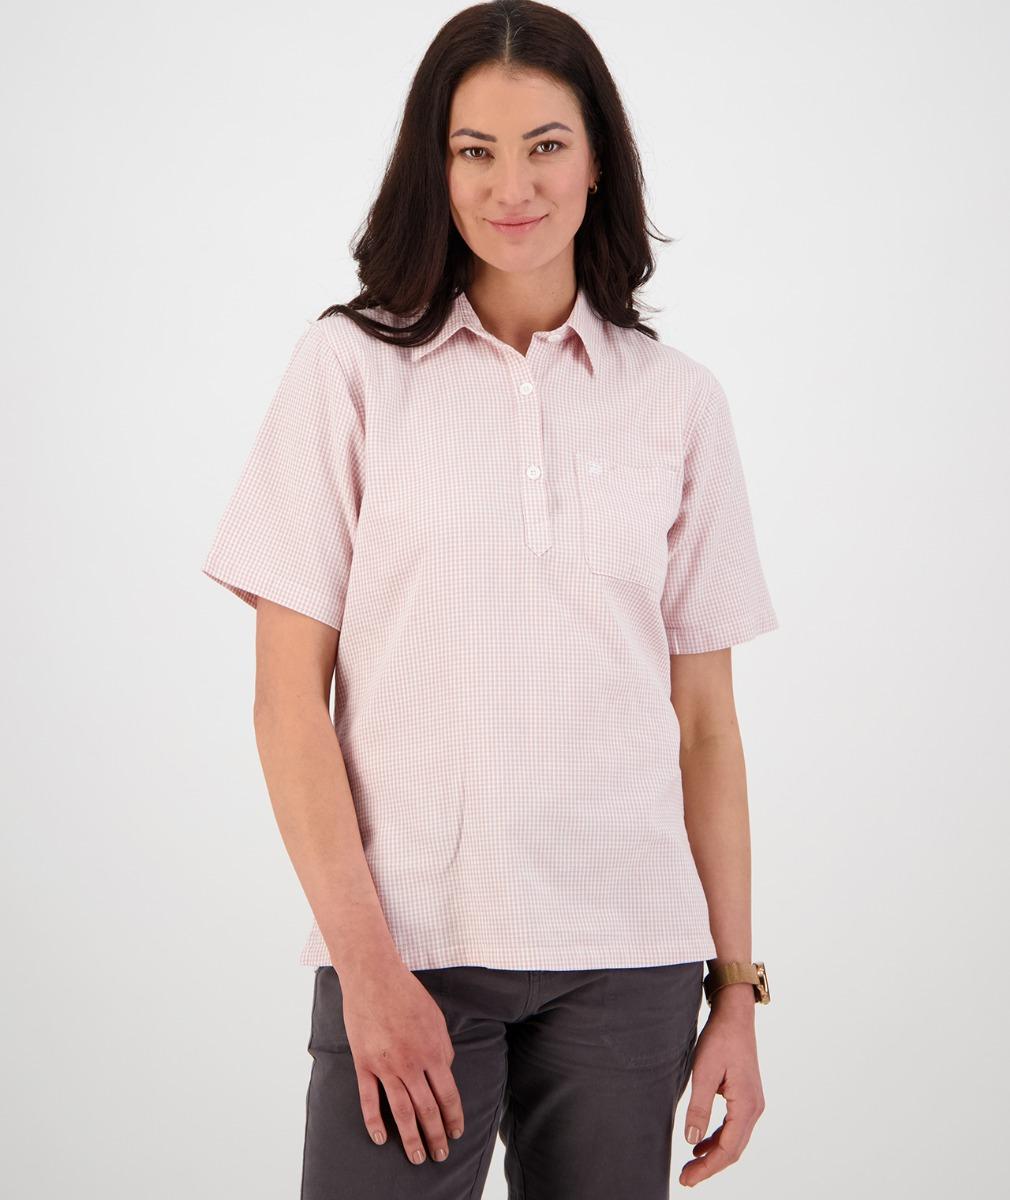 Swanndri Women's Tasman 100% Cotton Short Sleeve Shirt in Pink/White Gingham